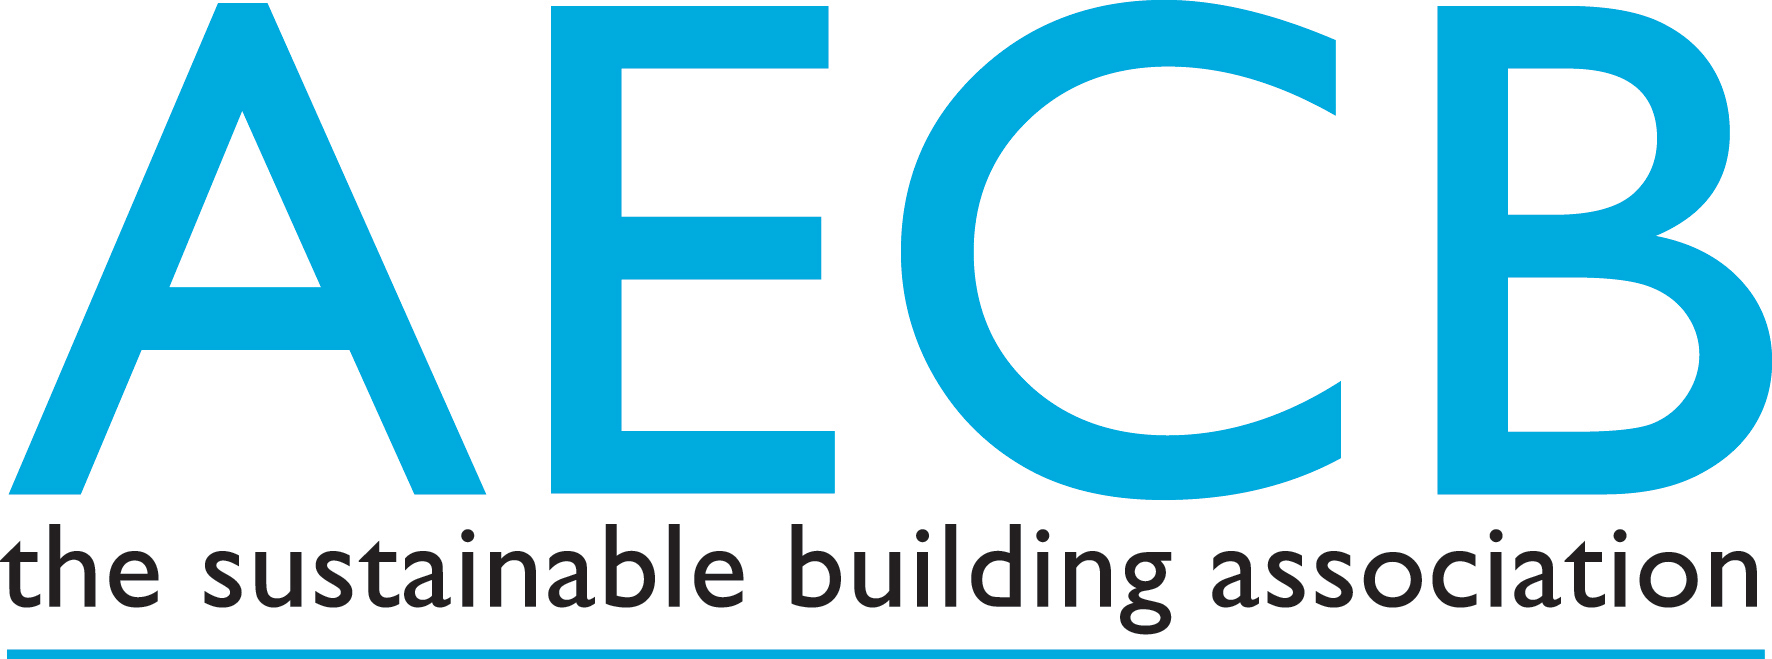 AECB_Logo copy